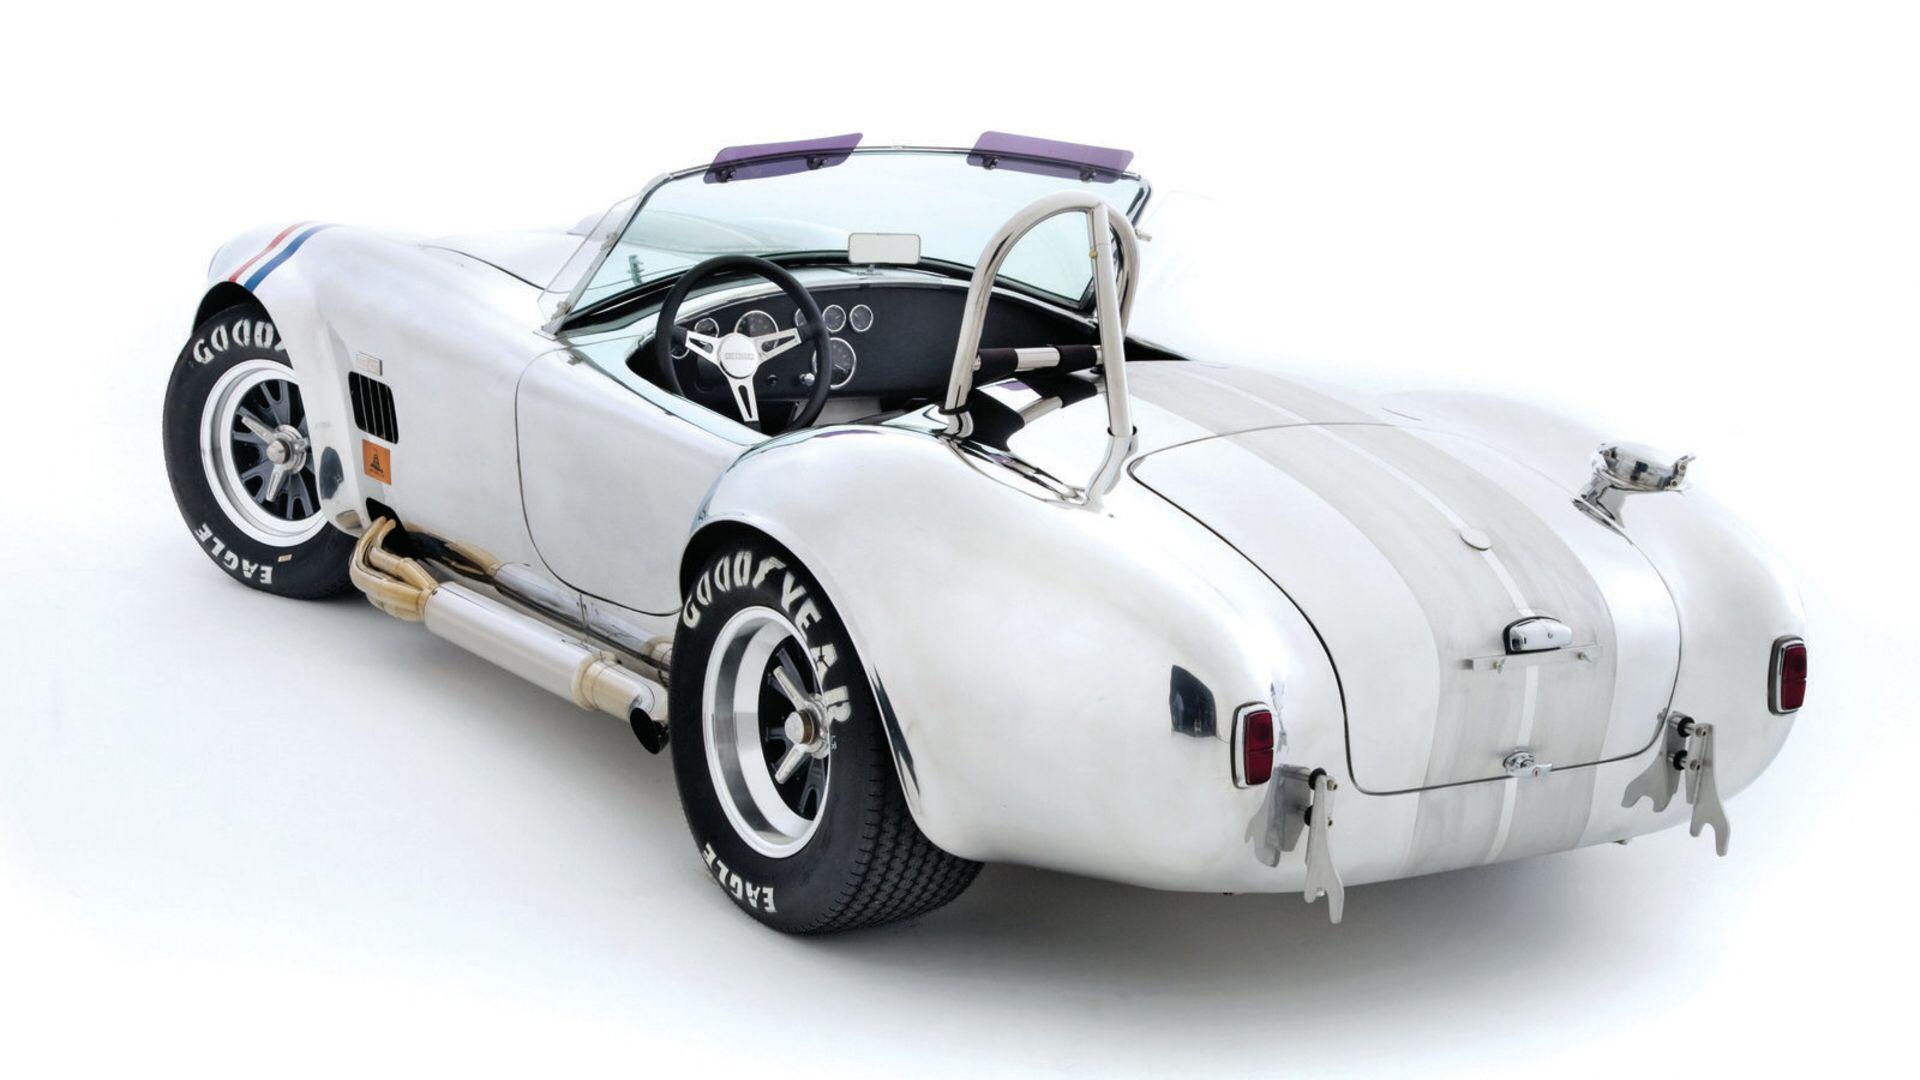 Shelby cobra replica by kirkham motorsports